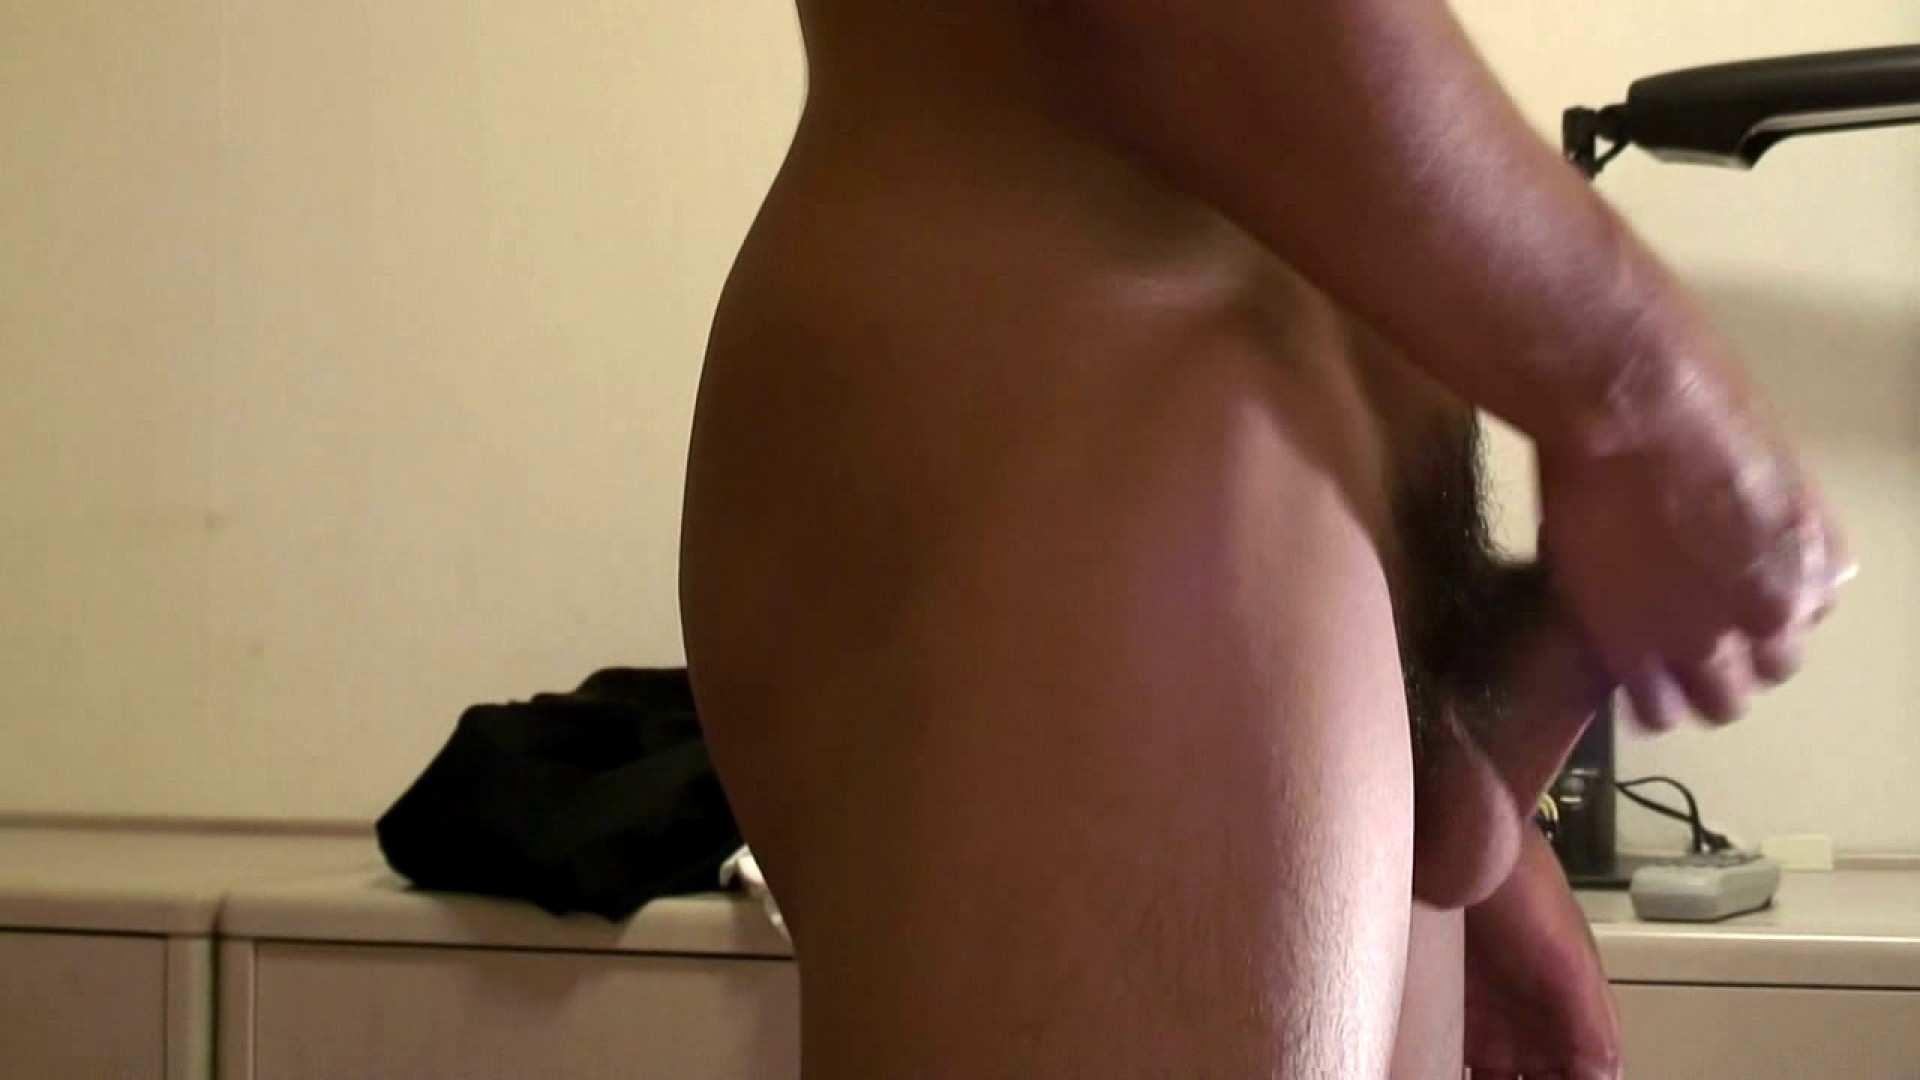 muscle warrior ~男根肉弾戦~03 ゲイのオナニー映像 ゲイアダルトビデオ画像 62枚 24